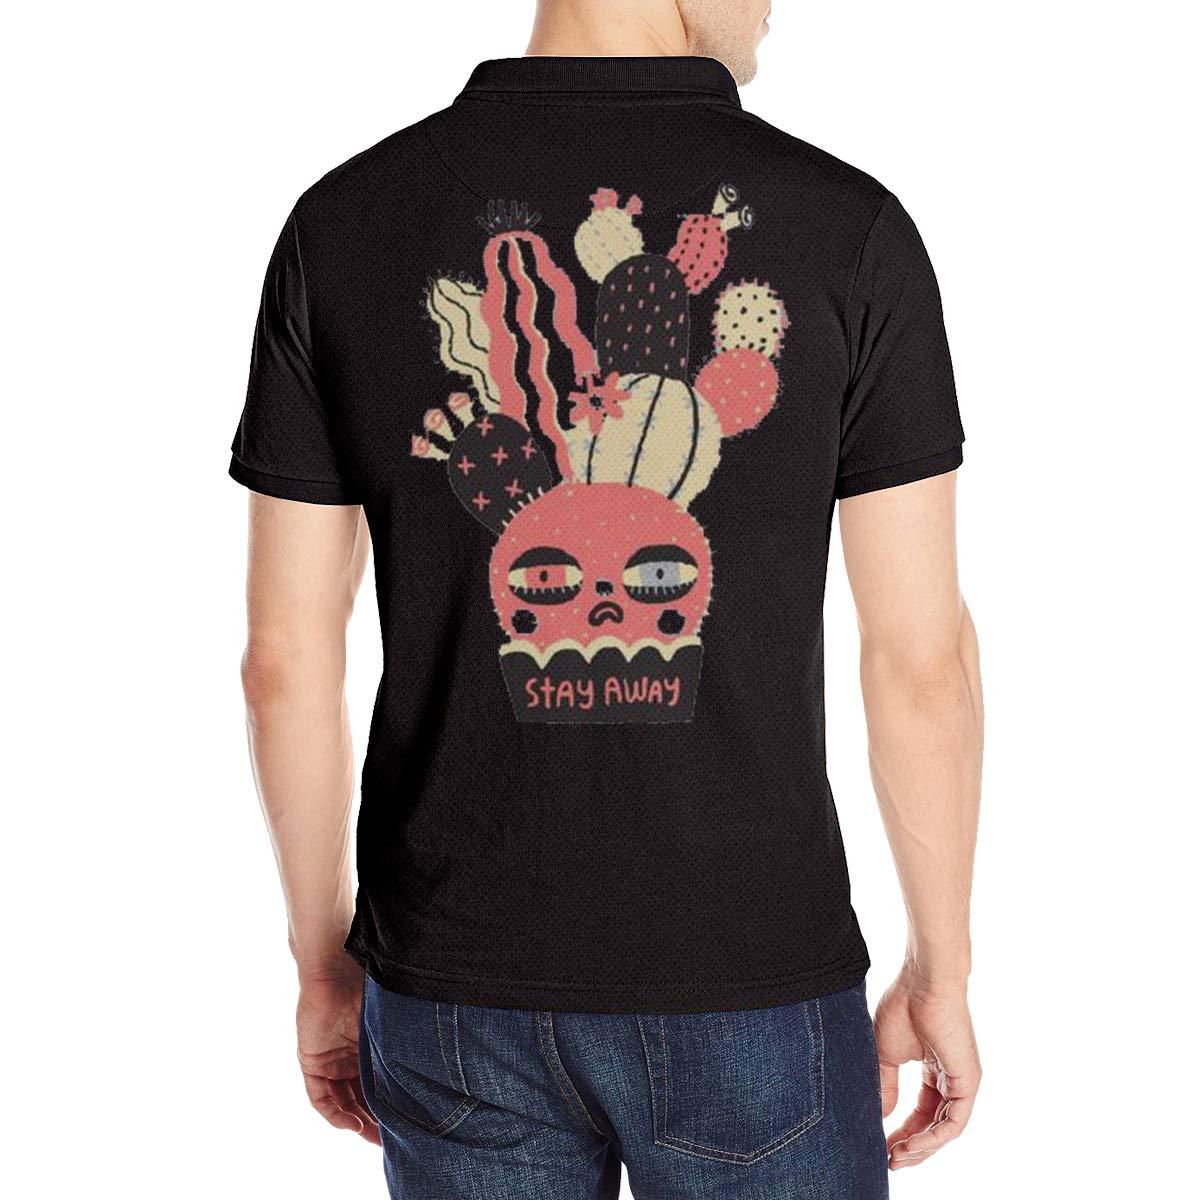 6cdd6c841 Amazon.com  JJHH Shop Angry Cactus Stay Away Men s Boy Office Golf Polo  Shirt  Clothing